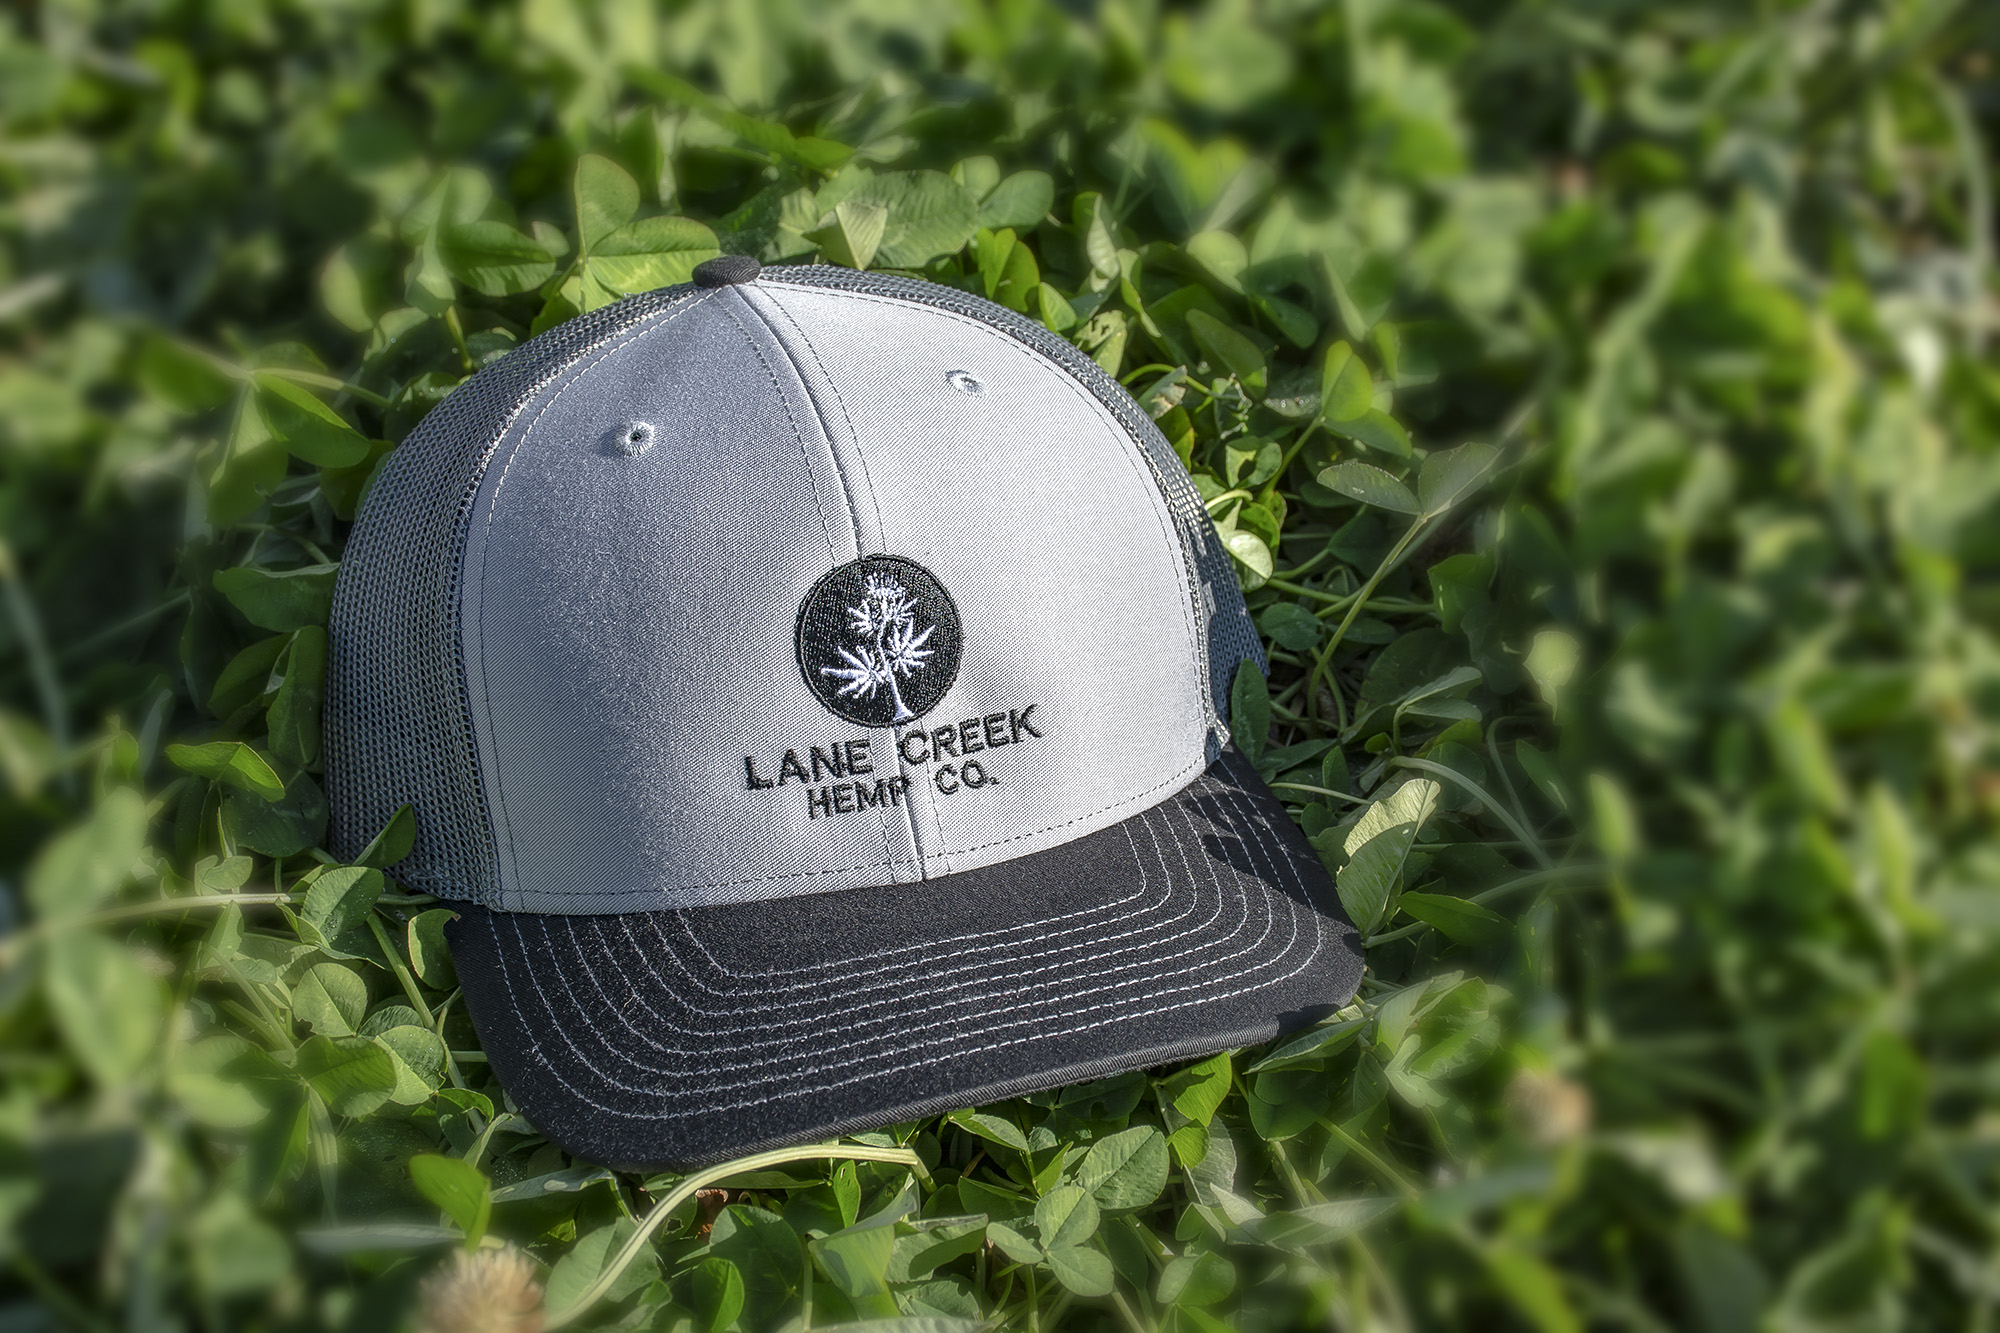 Lane Creek Hemp Co Carbon Trucker Hat